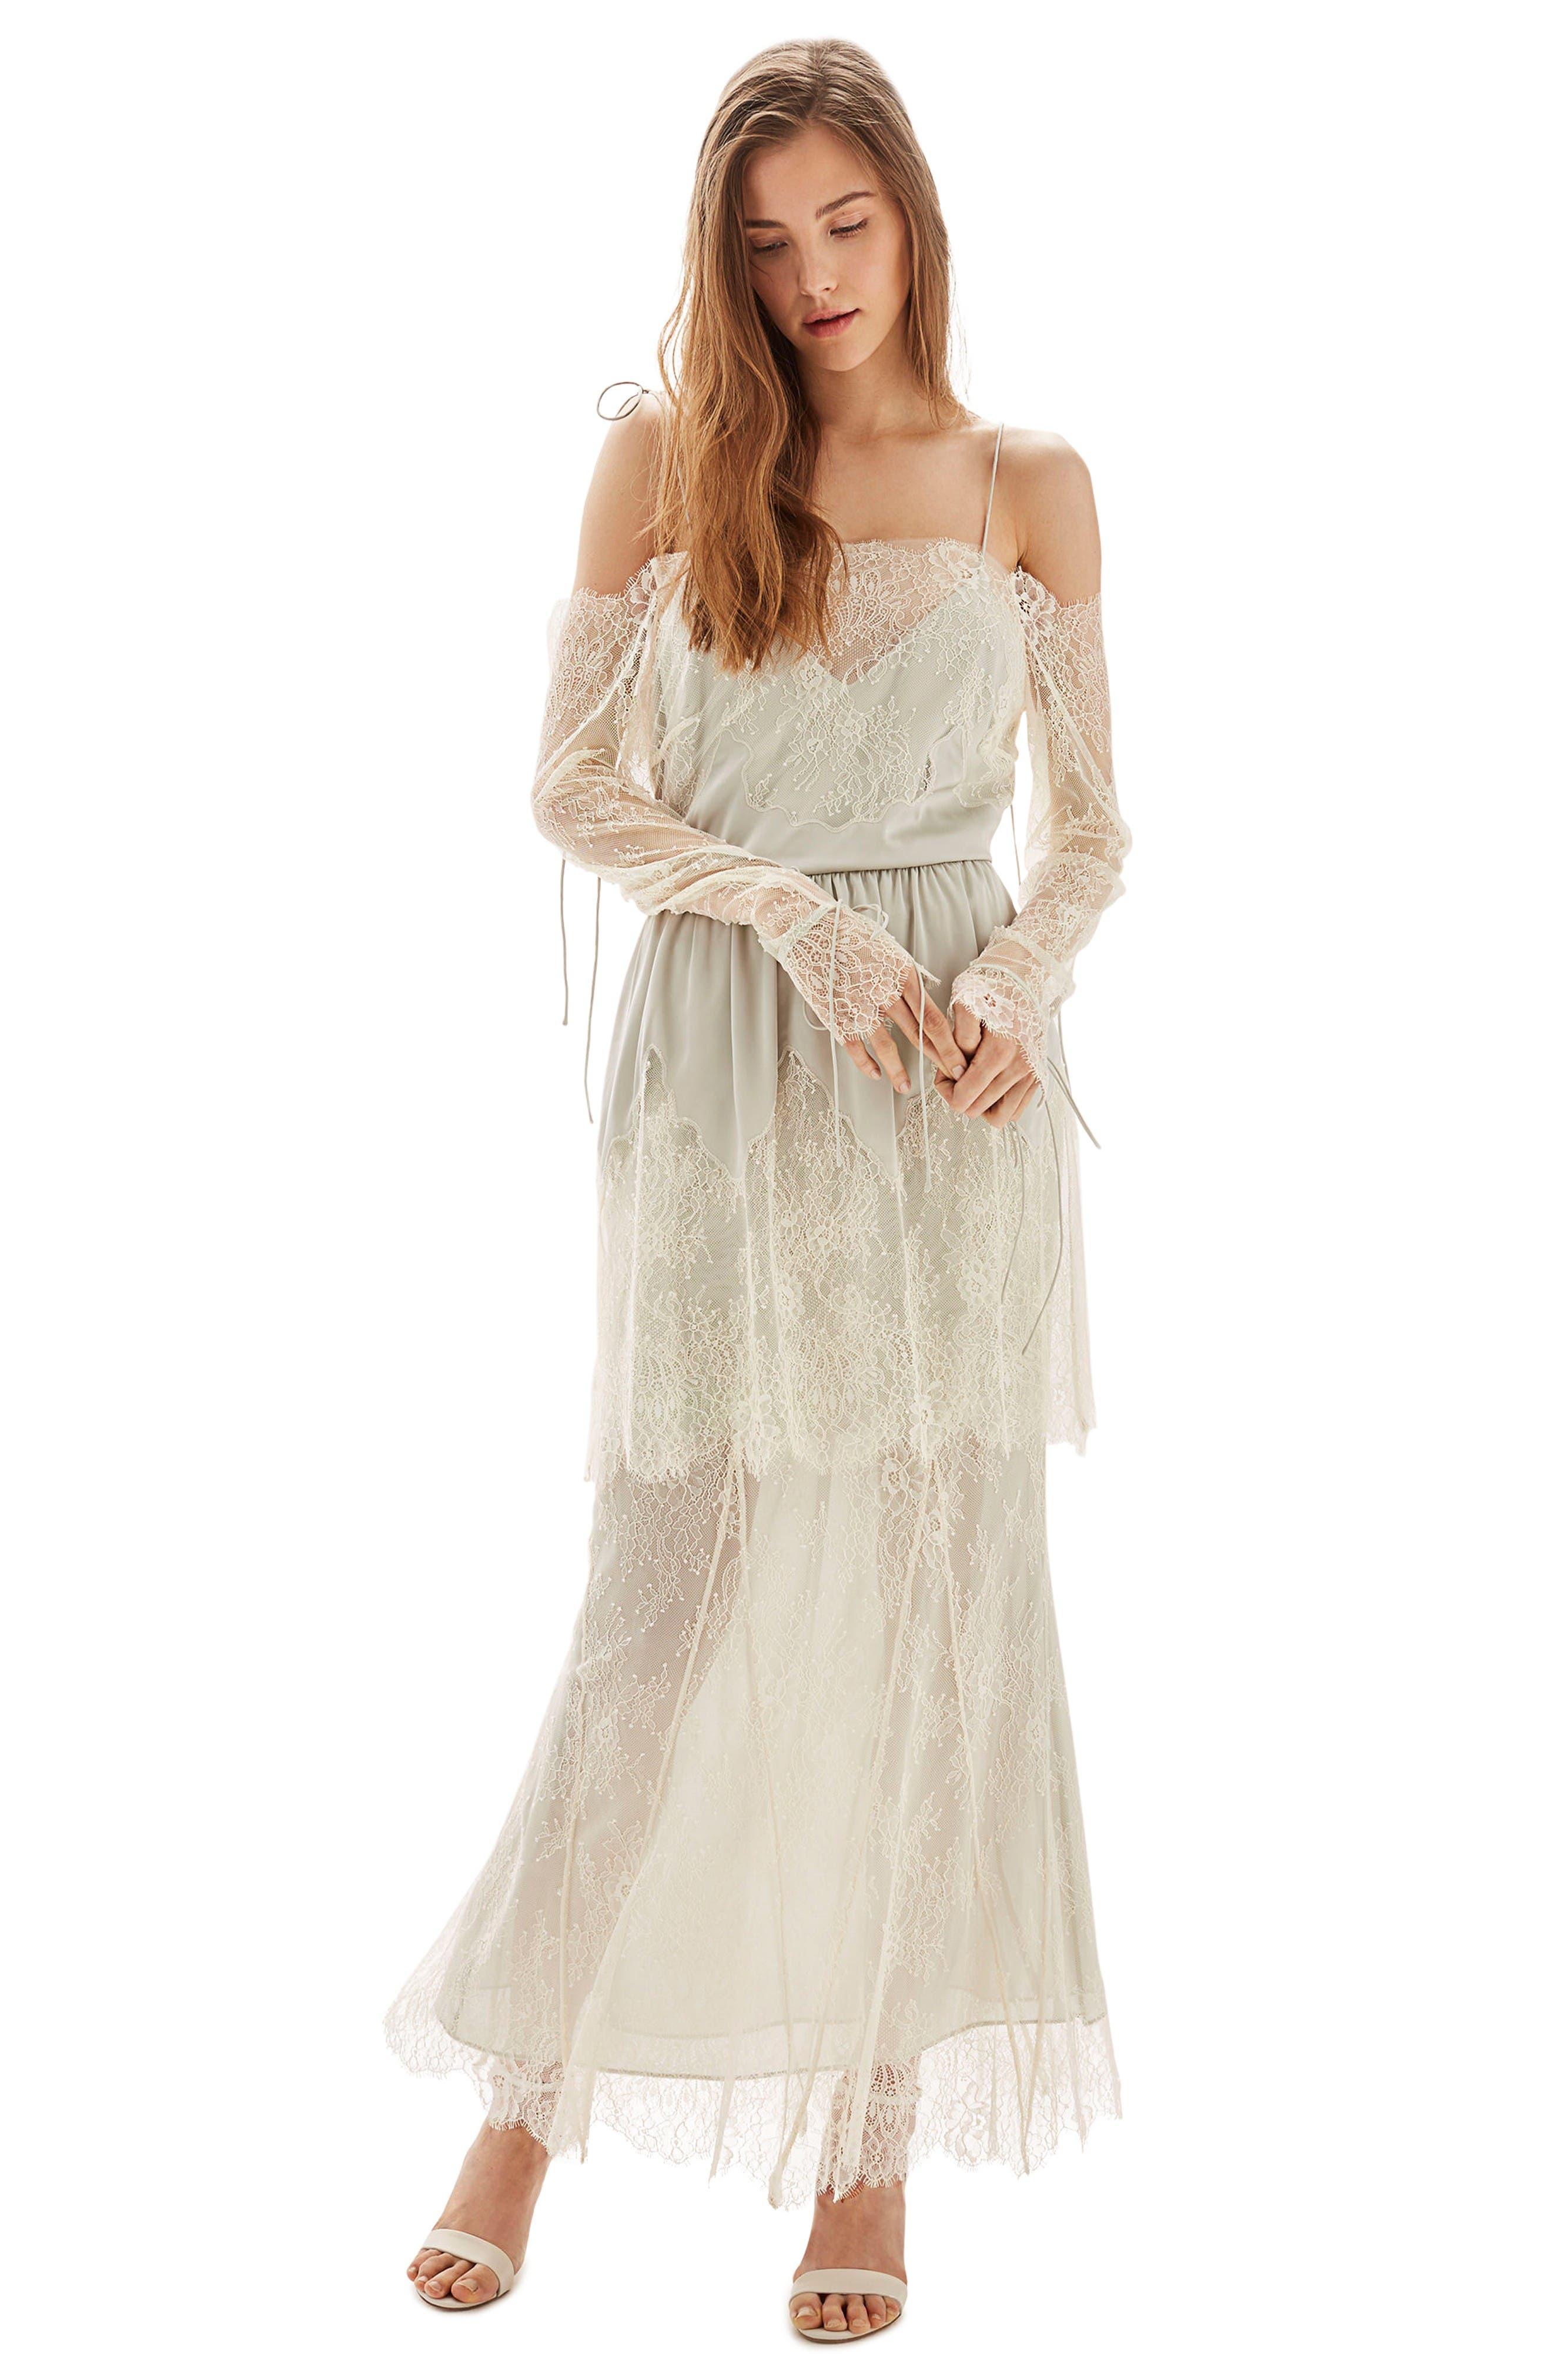 Topshop Bride Bardot Lace Off the Shoulder Gown